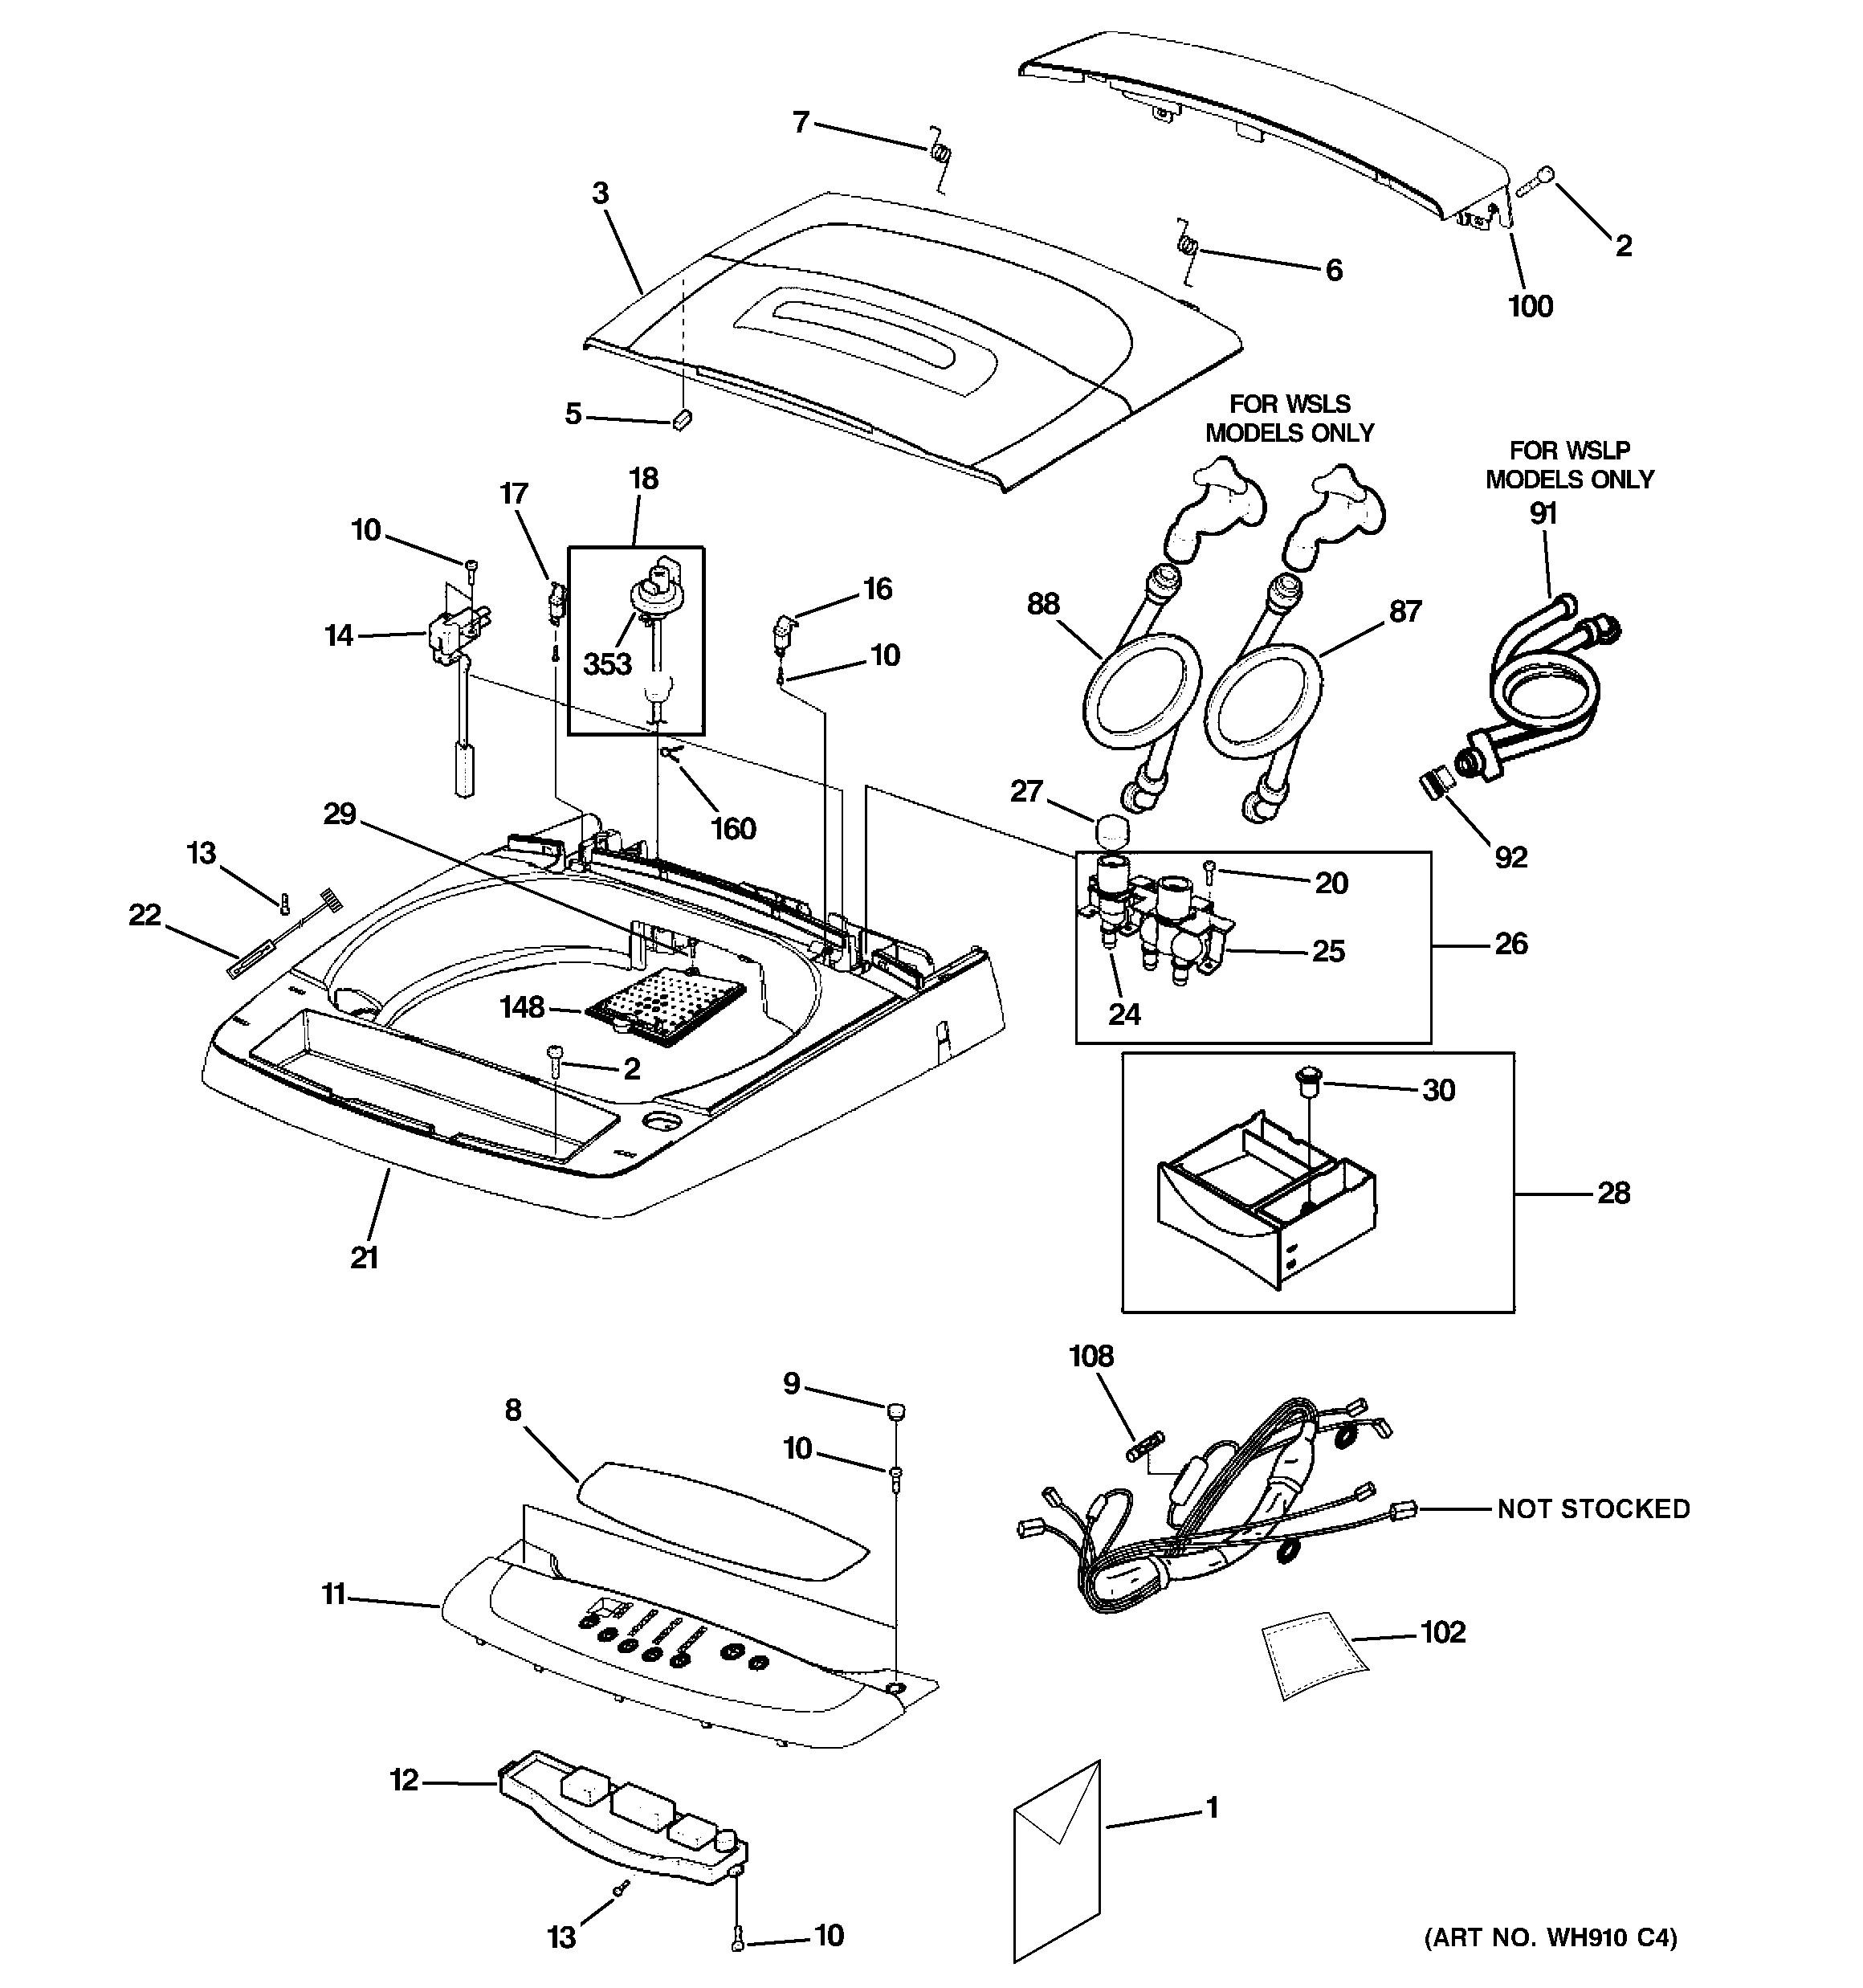 Ge Quiet Power 3 Parts Diagram Ge Washer Parts Model Wslp1500j0ww Of Ge Quiet Power 3 Parts Diagram